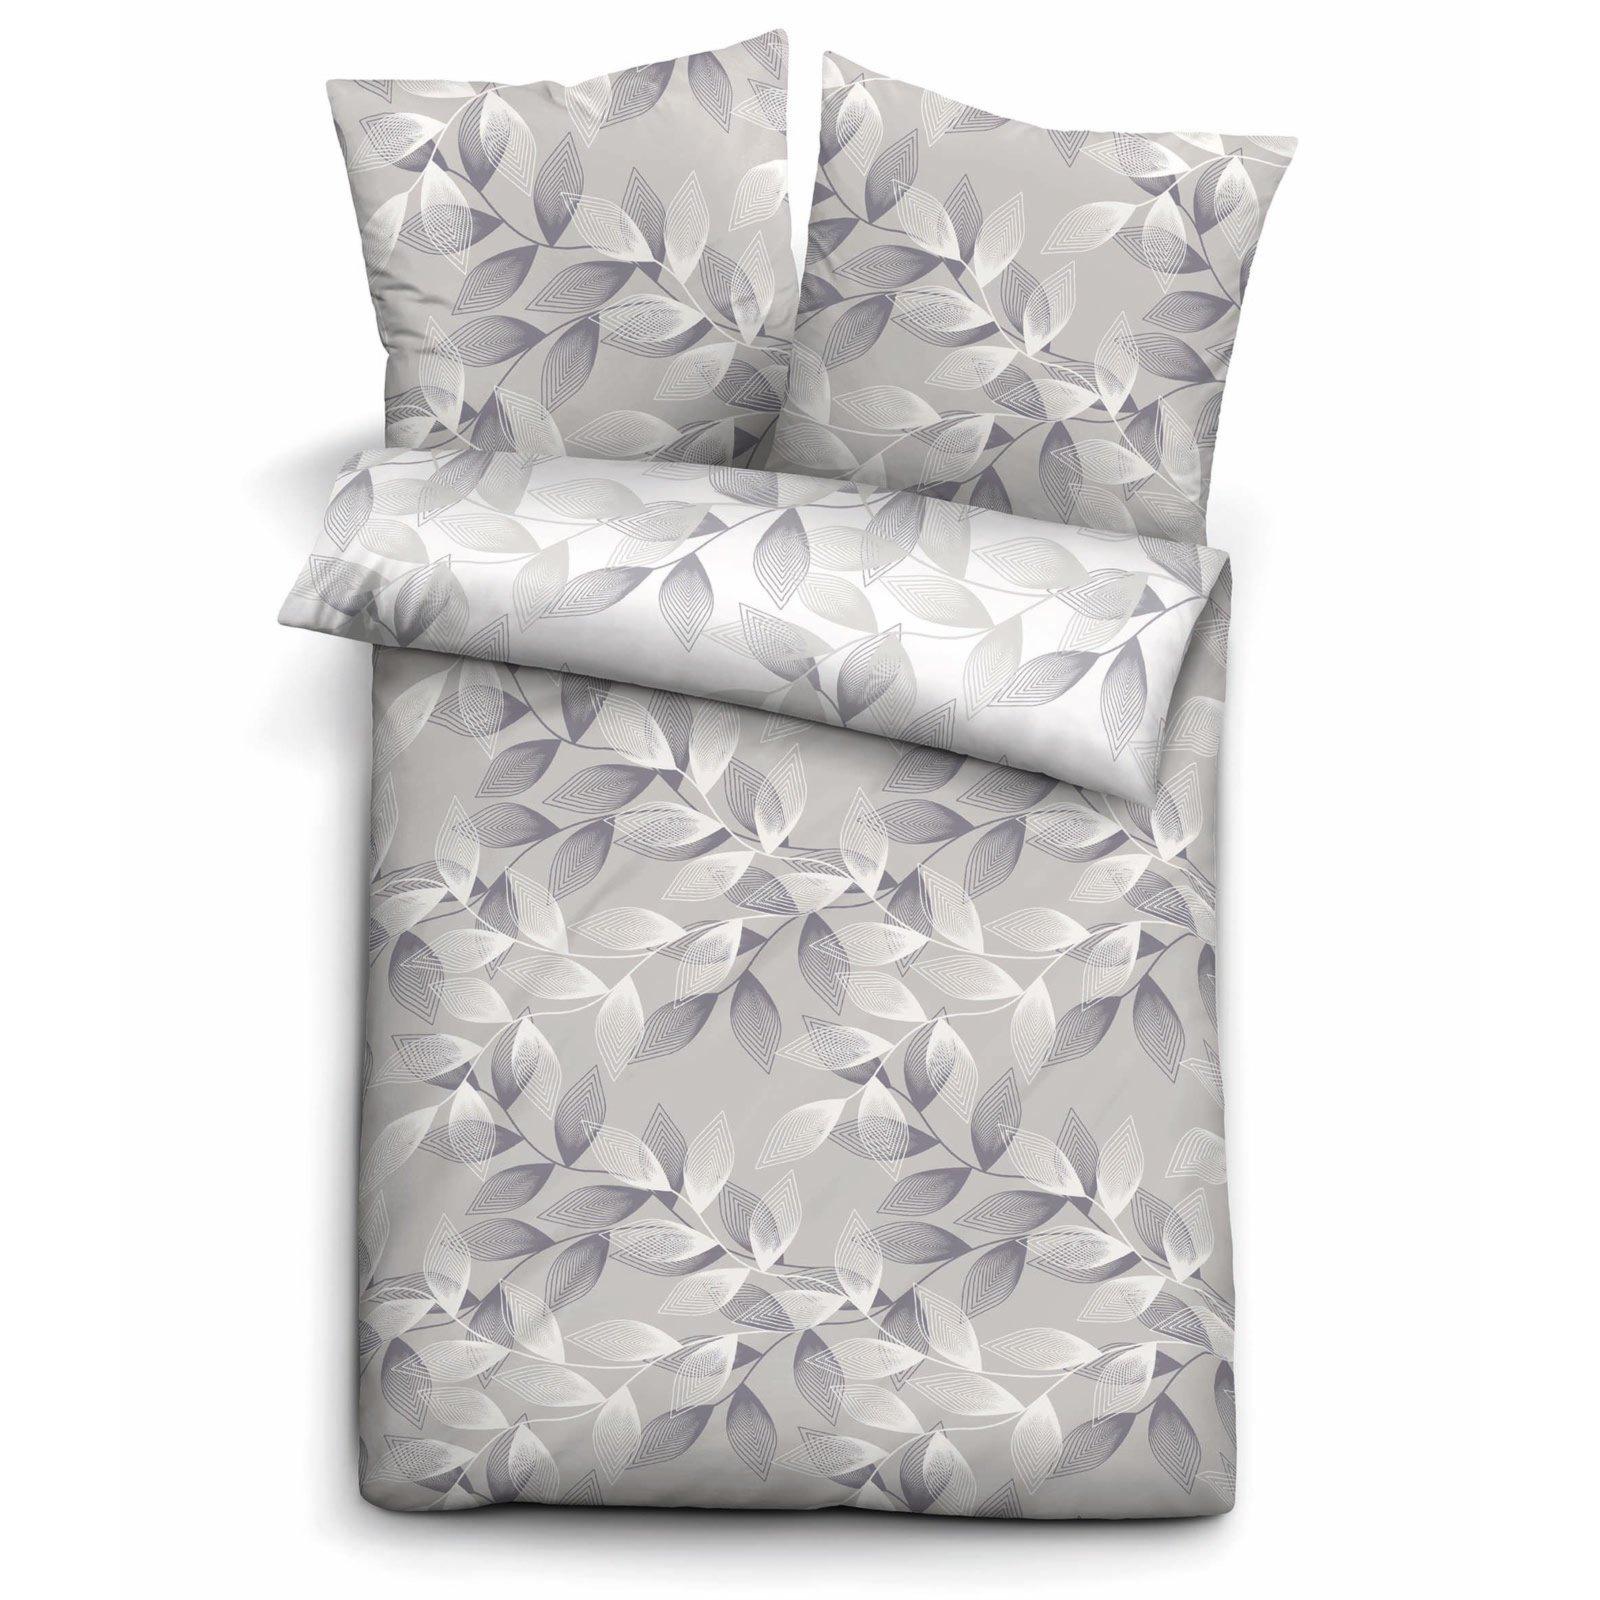 renforc bettw sche biberna grau 135x200 cm bettw sche bettw sche bettlaken. Black Bedroom Furniture Sets. Home Design Ideas